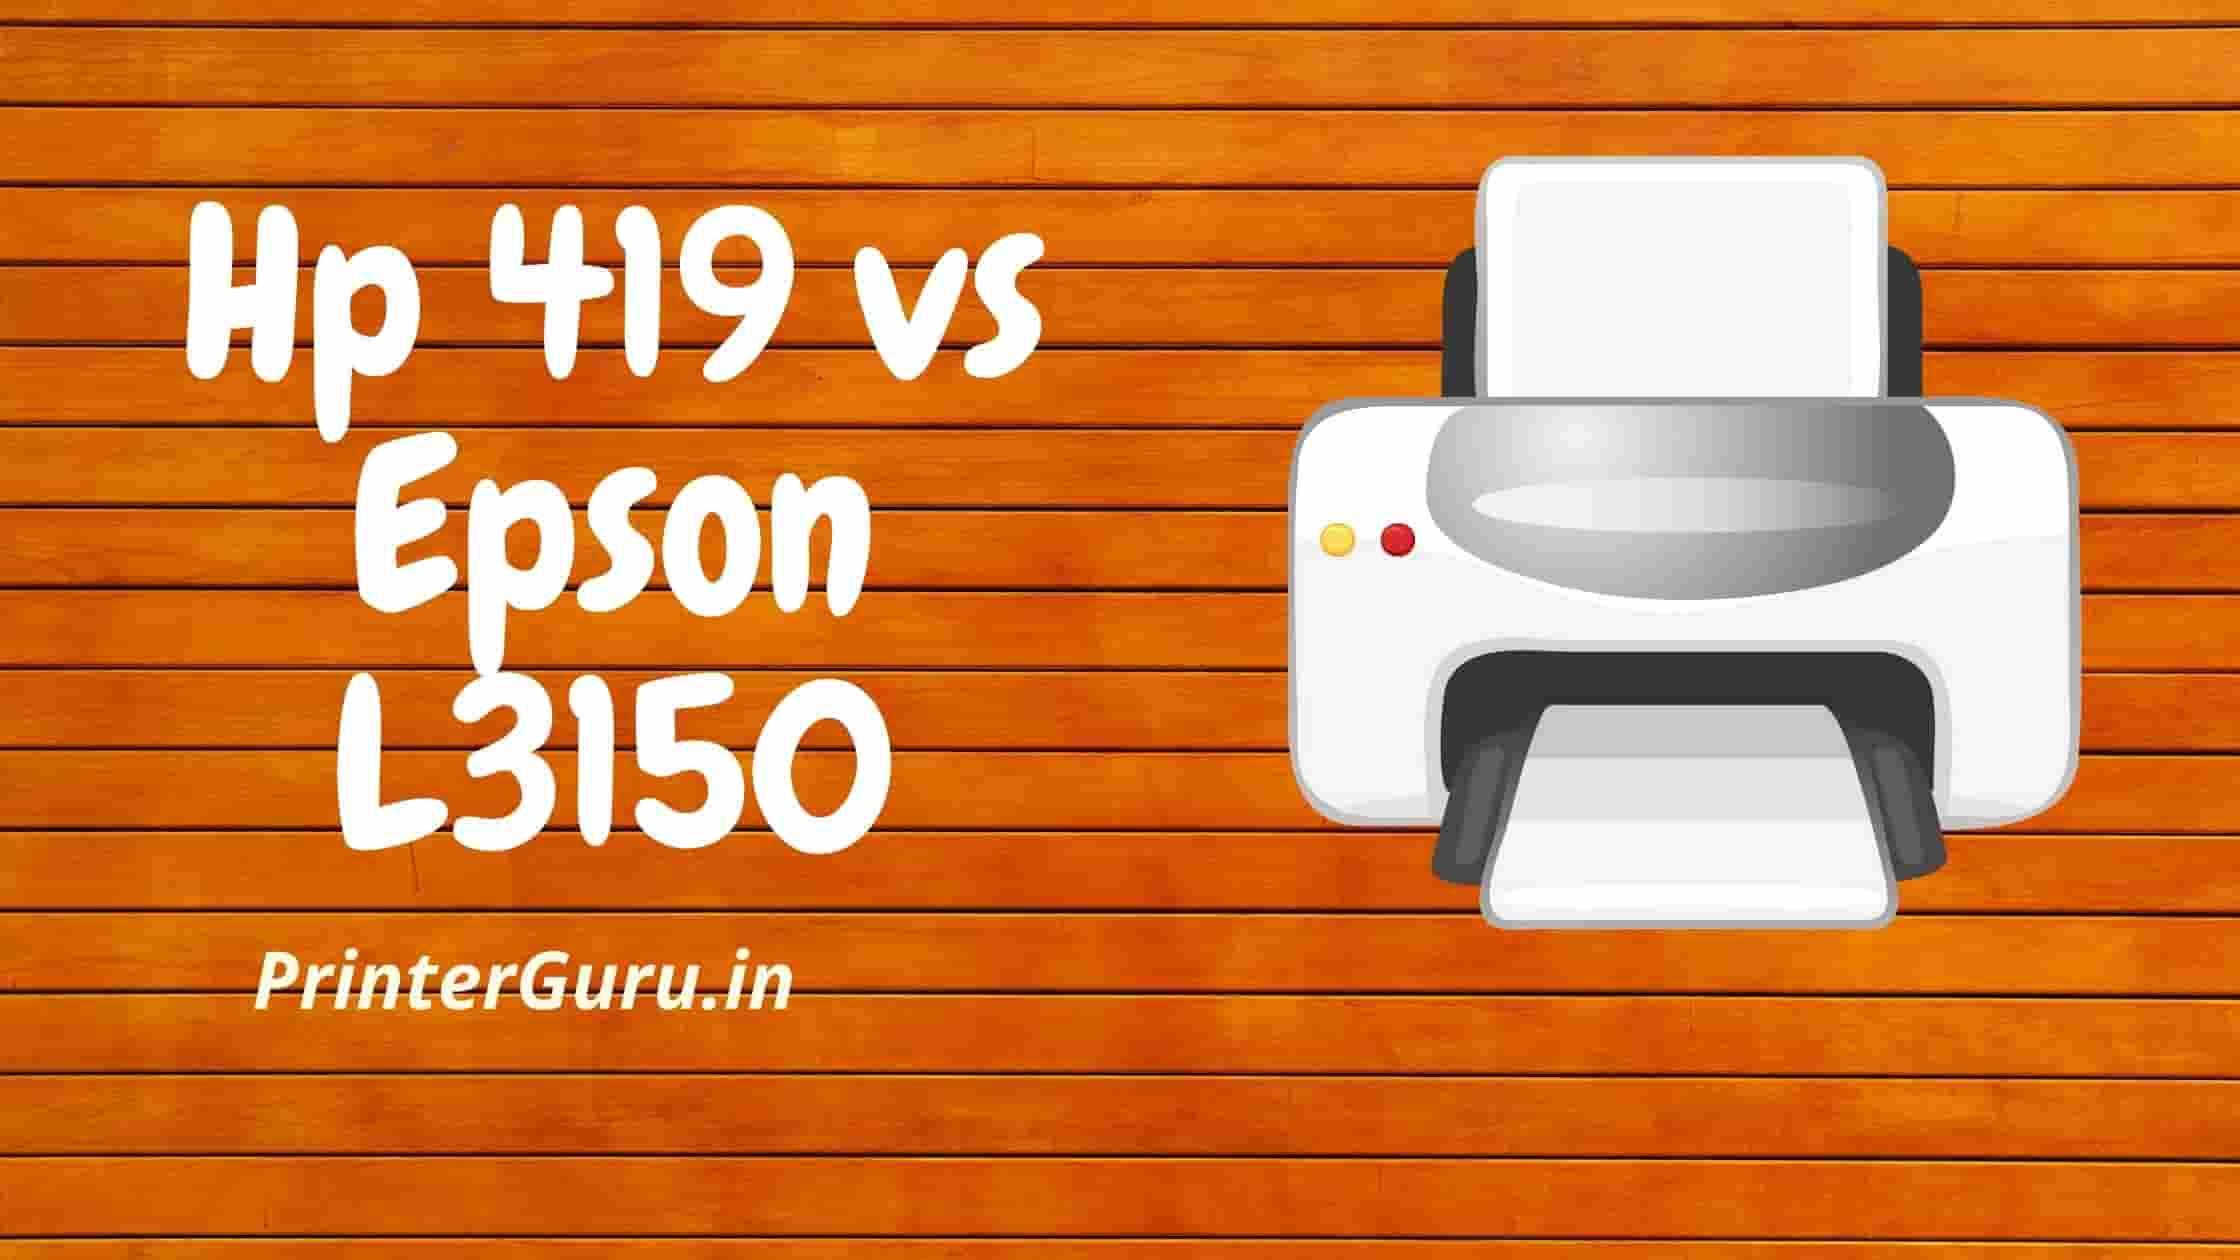 Hp 419 vs Epson L3150